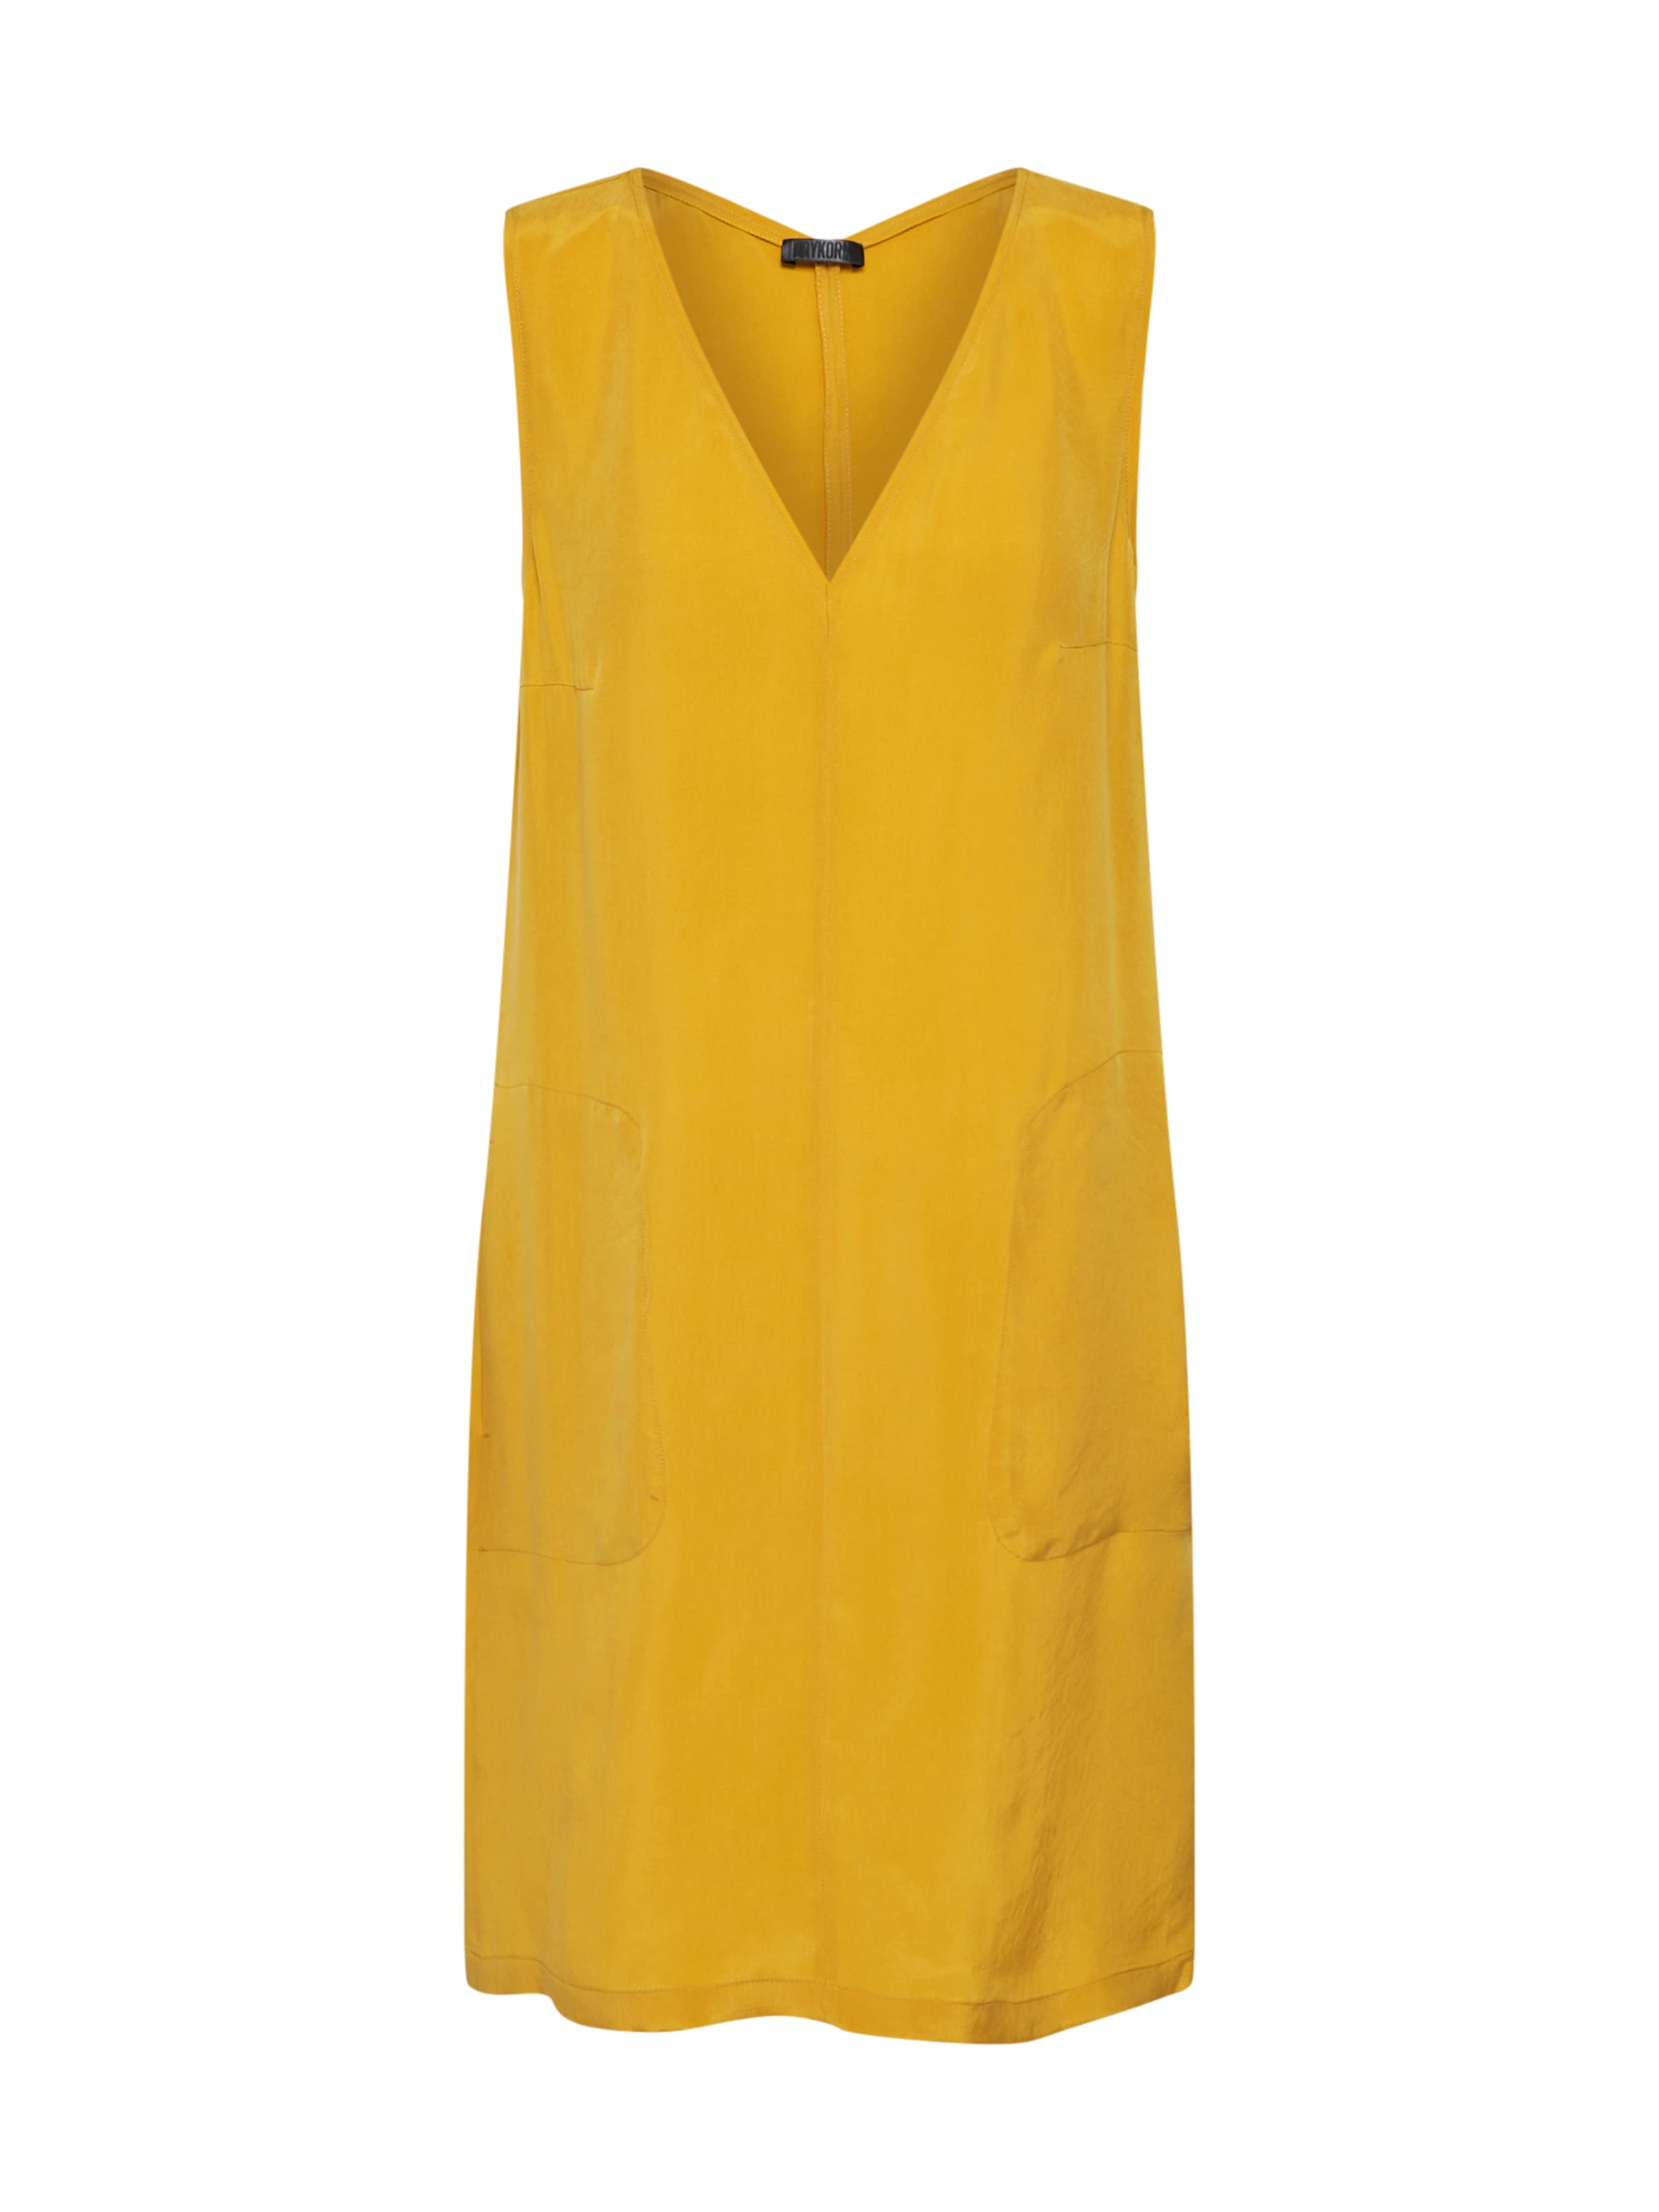 Drykorn 'serina' En 'serina' Robe Robe Drykorn En Jaune rWdBxoCe